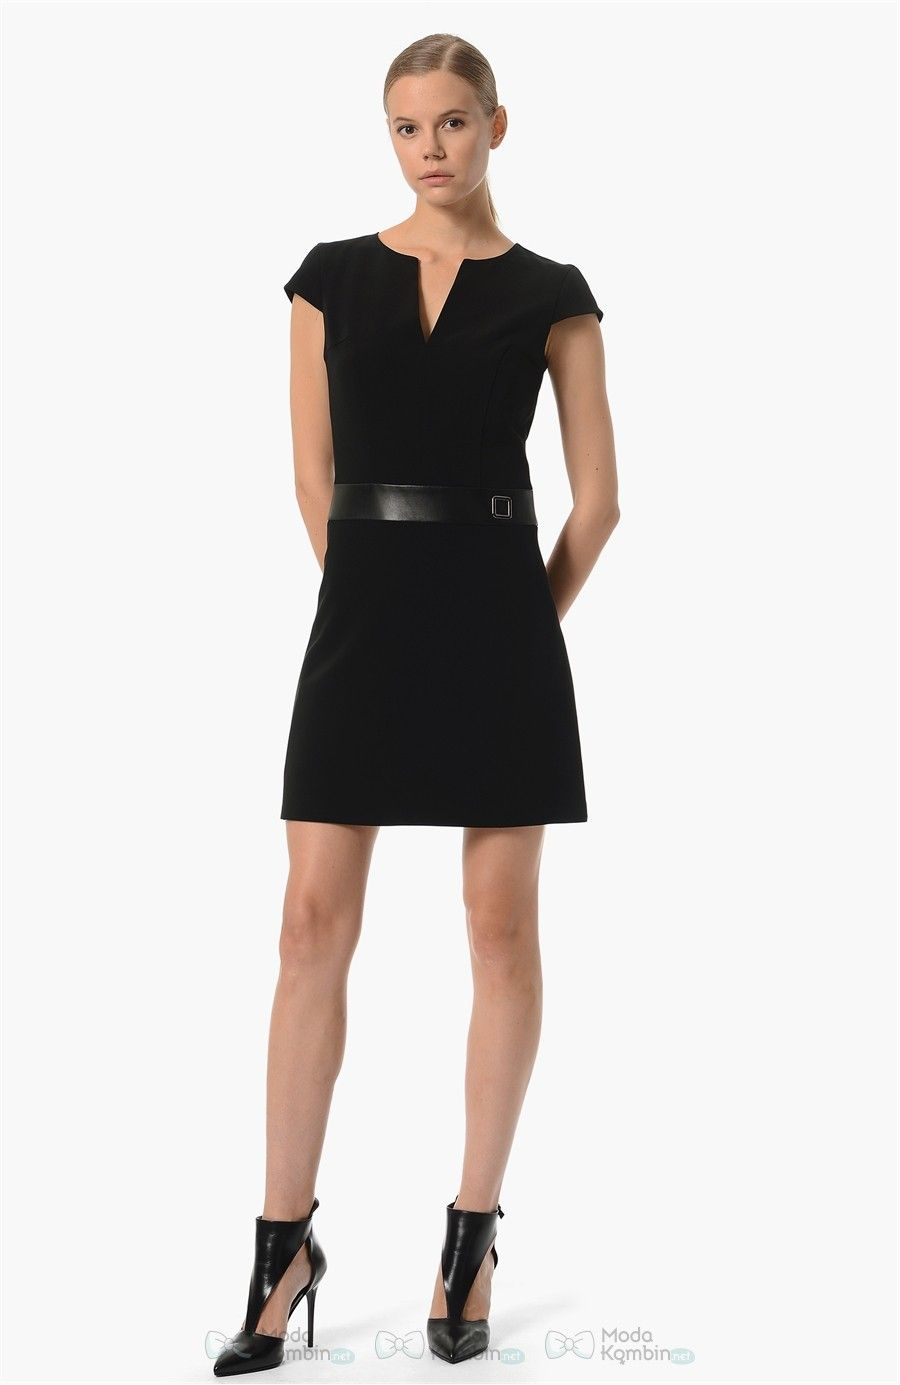 Modelleri ve elbise fiyatlar modasor com pictures to pin on pinterest - 2017 Network Bayan Elbise Modelleri 2017networkbayanelbisemodas 2017networkbayanelbisemodelleri G Nl Kelbisemodelleri